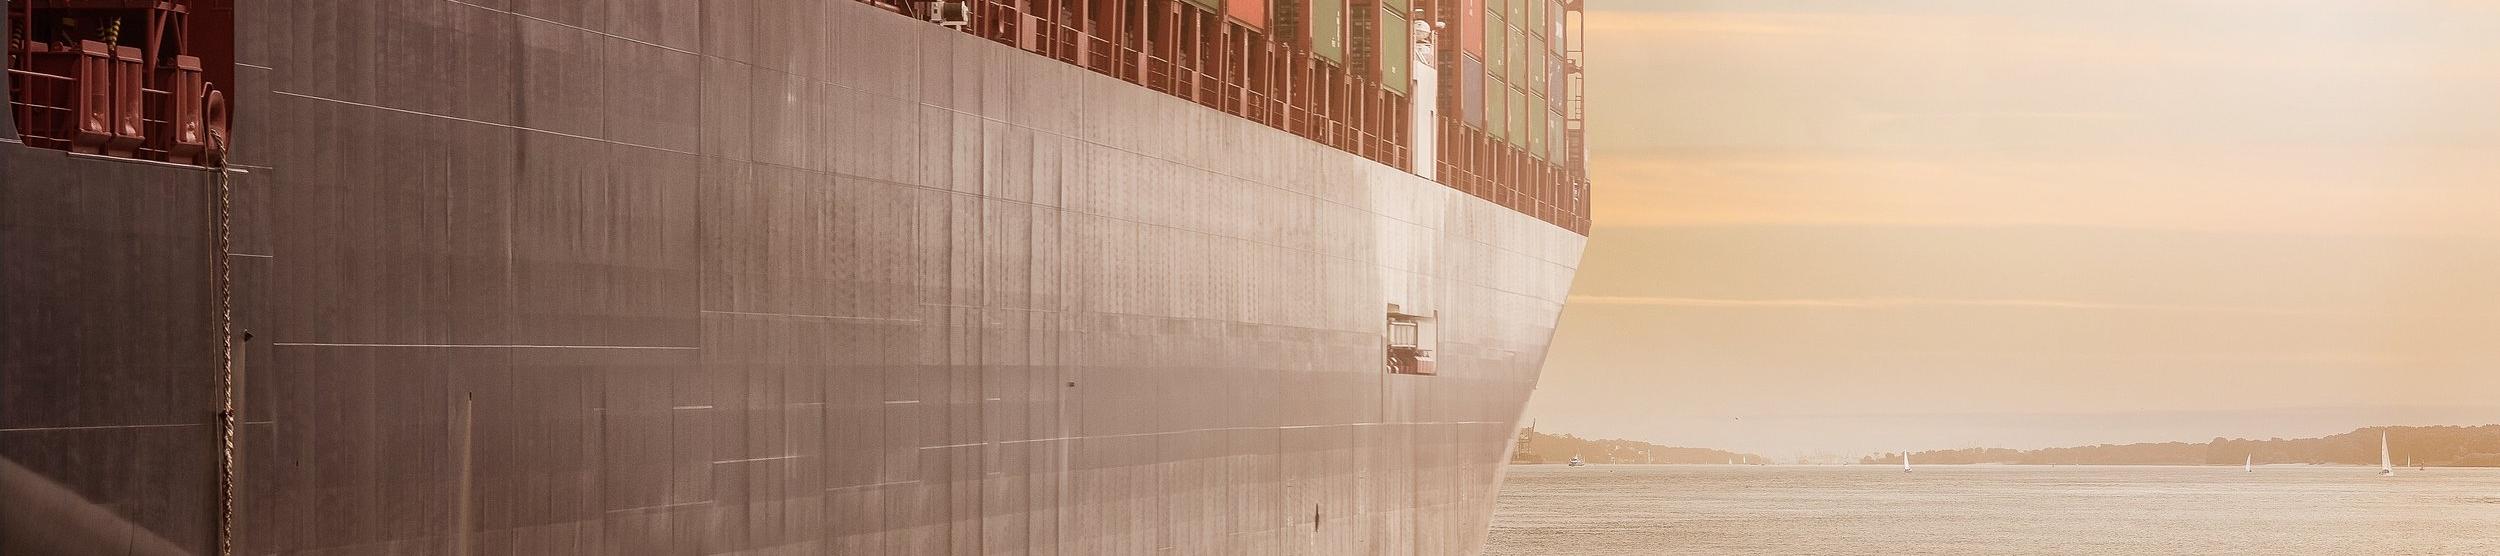 SHIPPING -